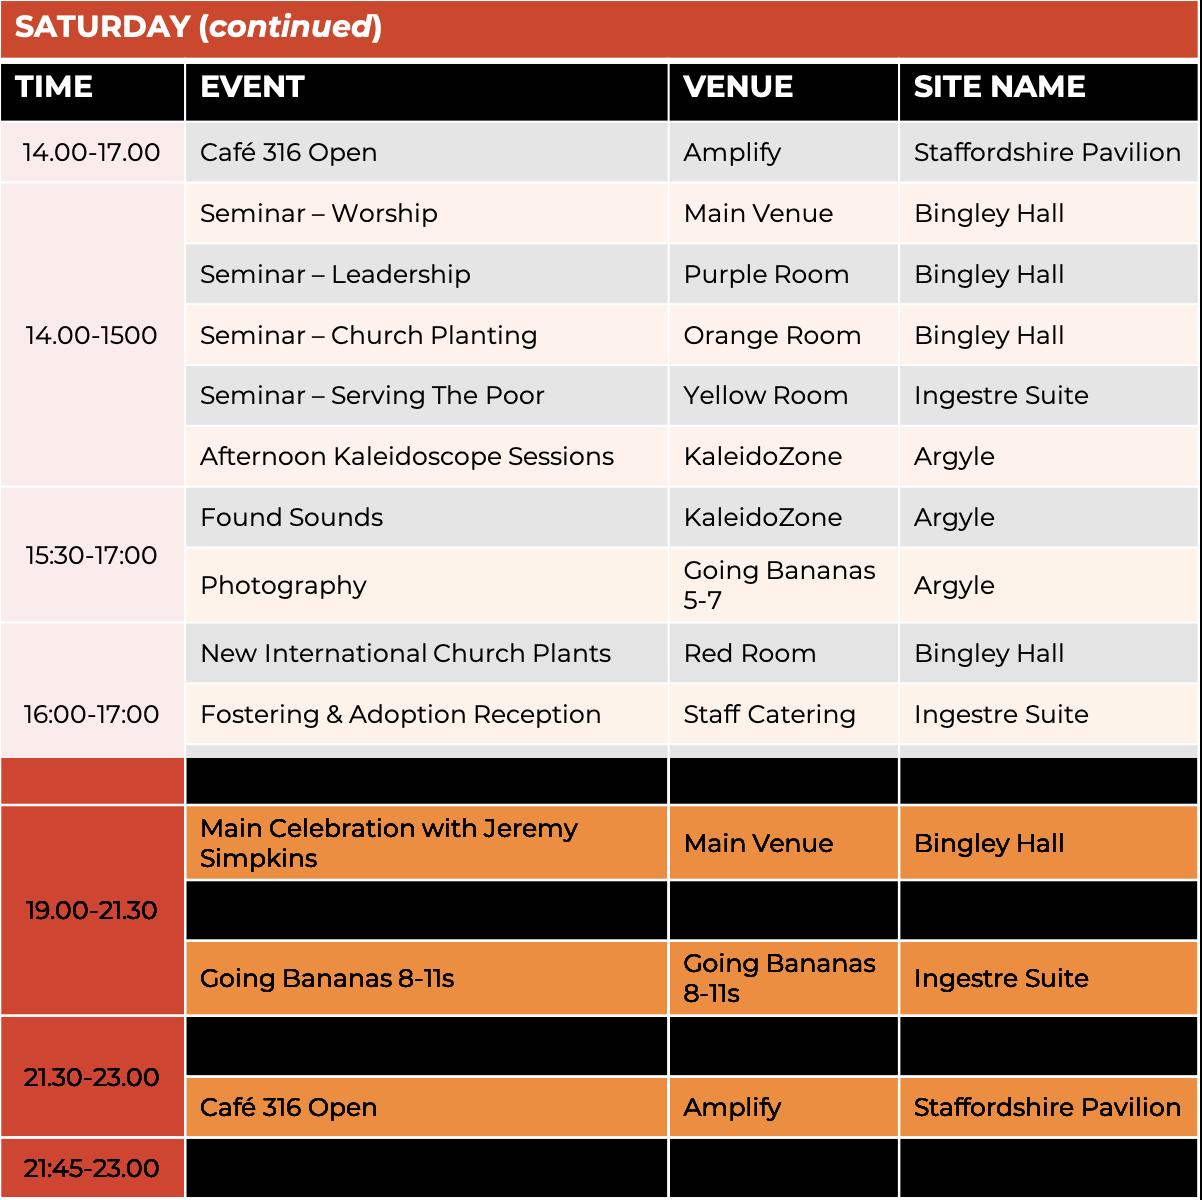 Schedule - Saturday 2